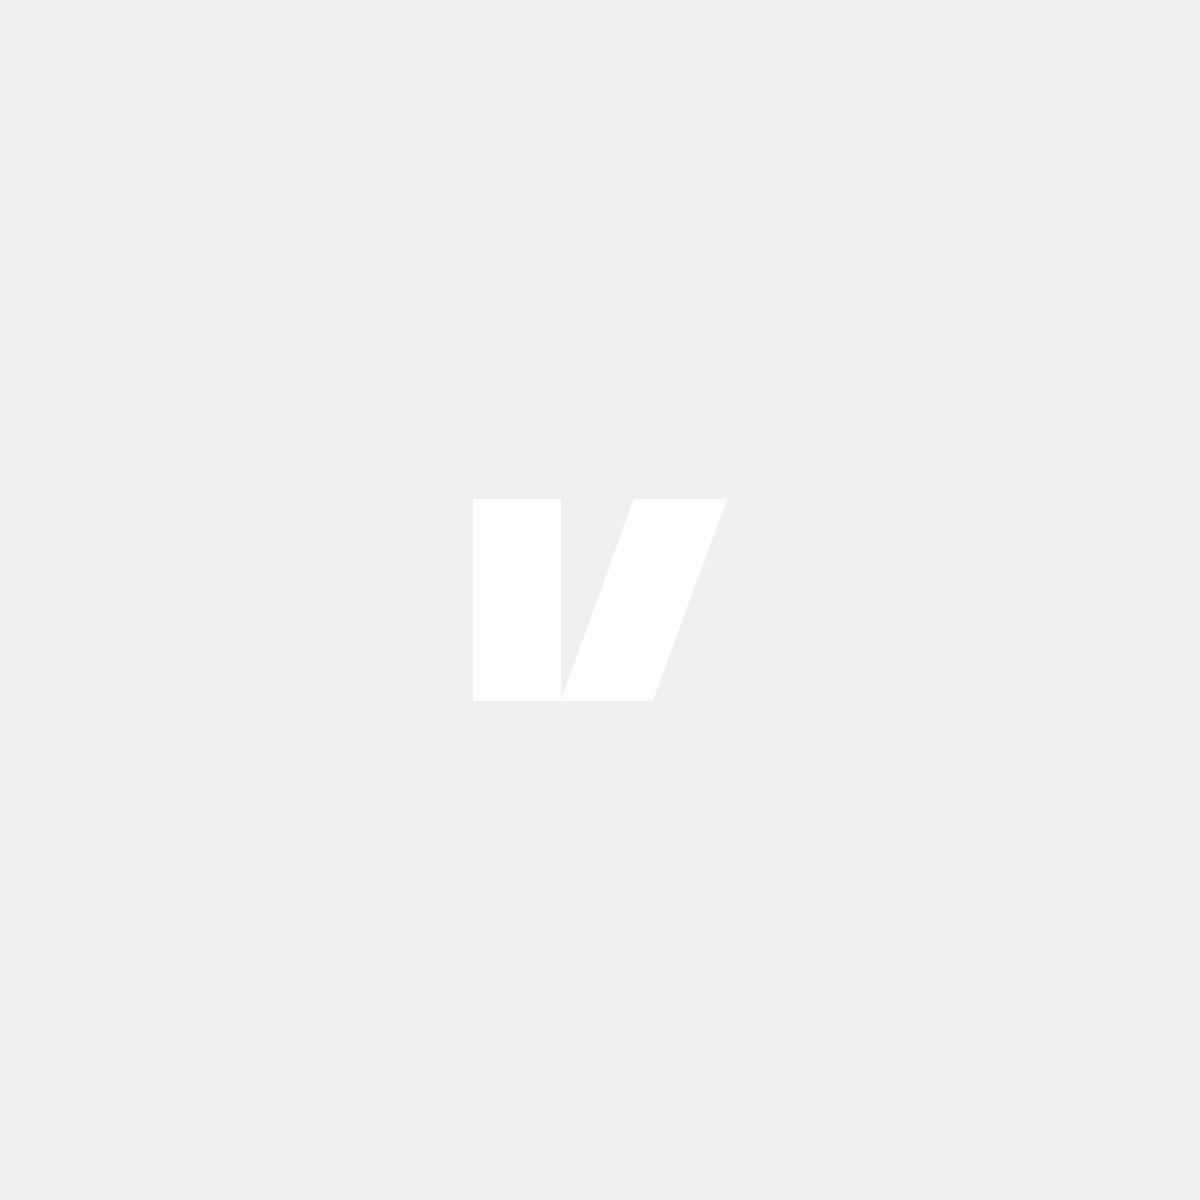 LSVI053(31259085-A)_b2.jpg